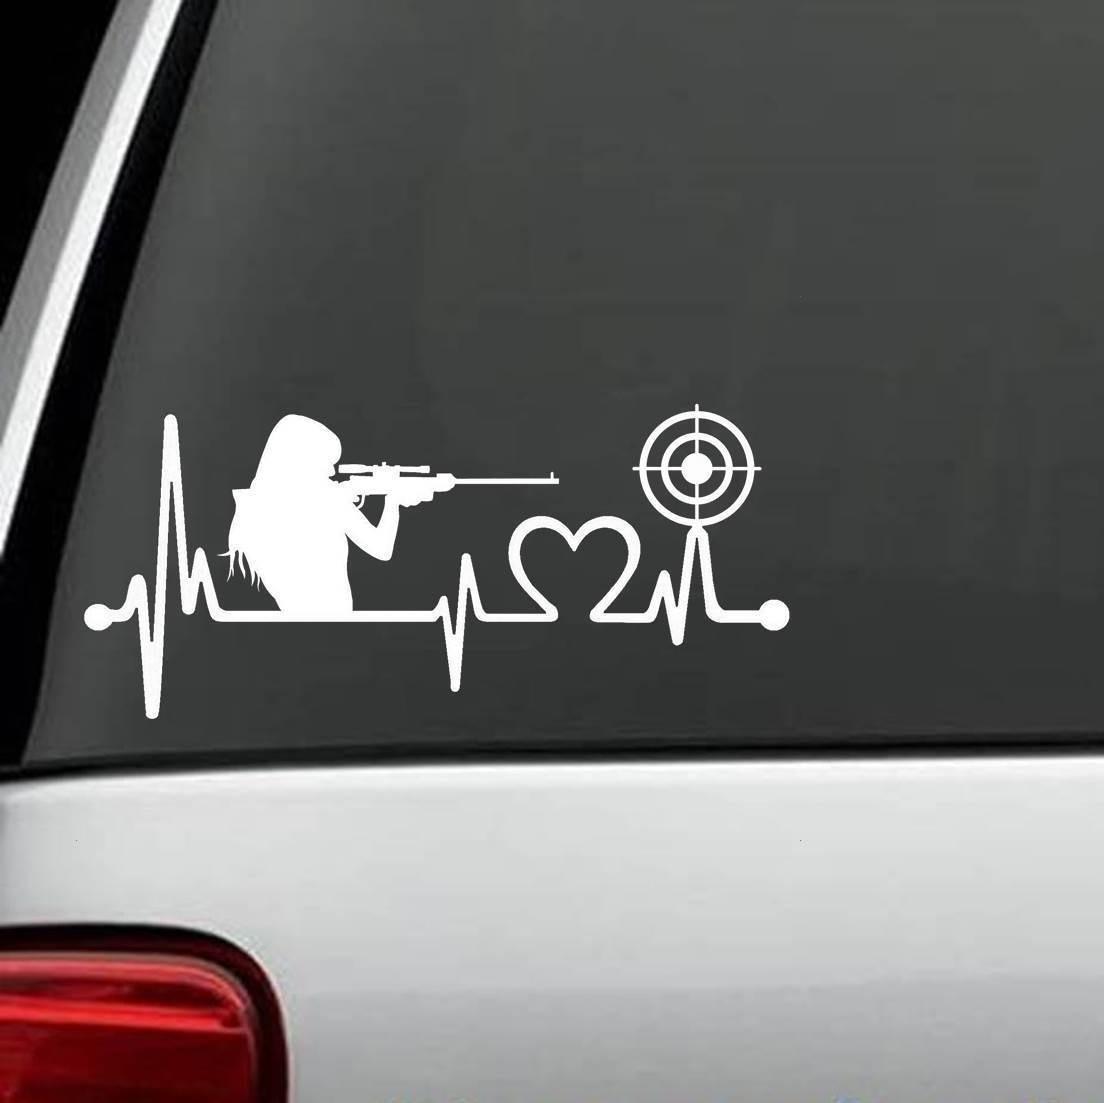 Gun Girl Heartbeat Target Shooting Decal Sticker Love Guns Window Sticker 15cm In Stickers From